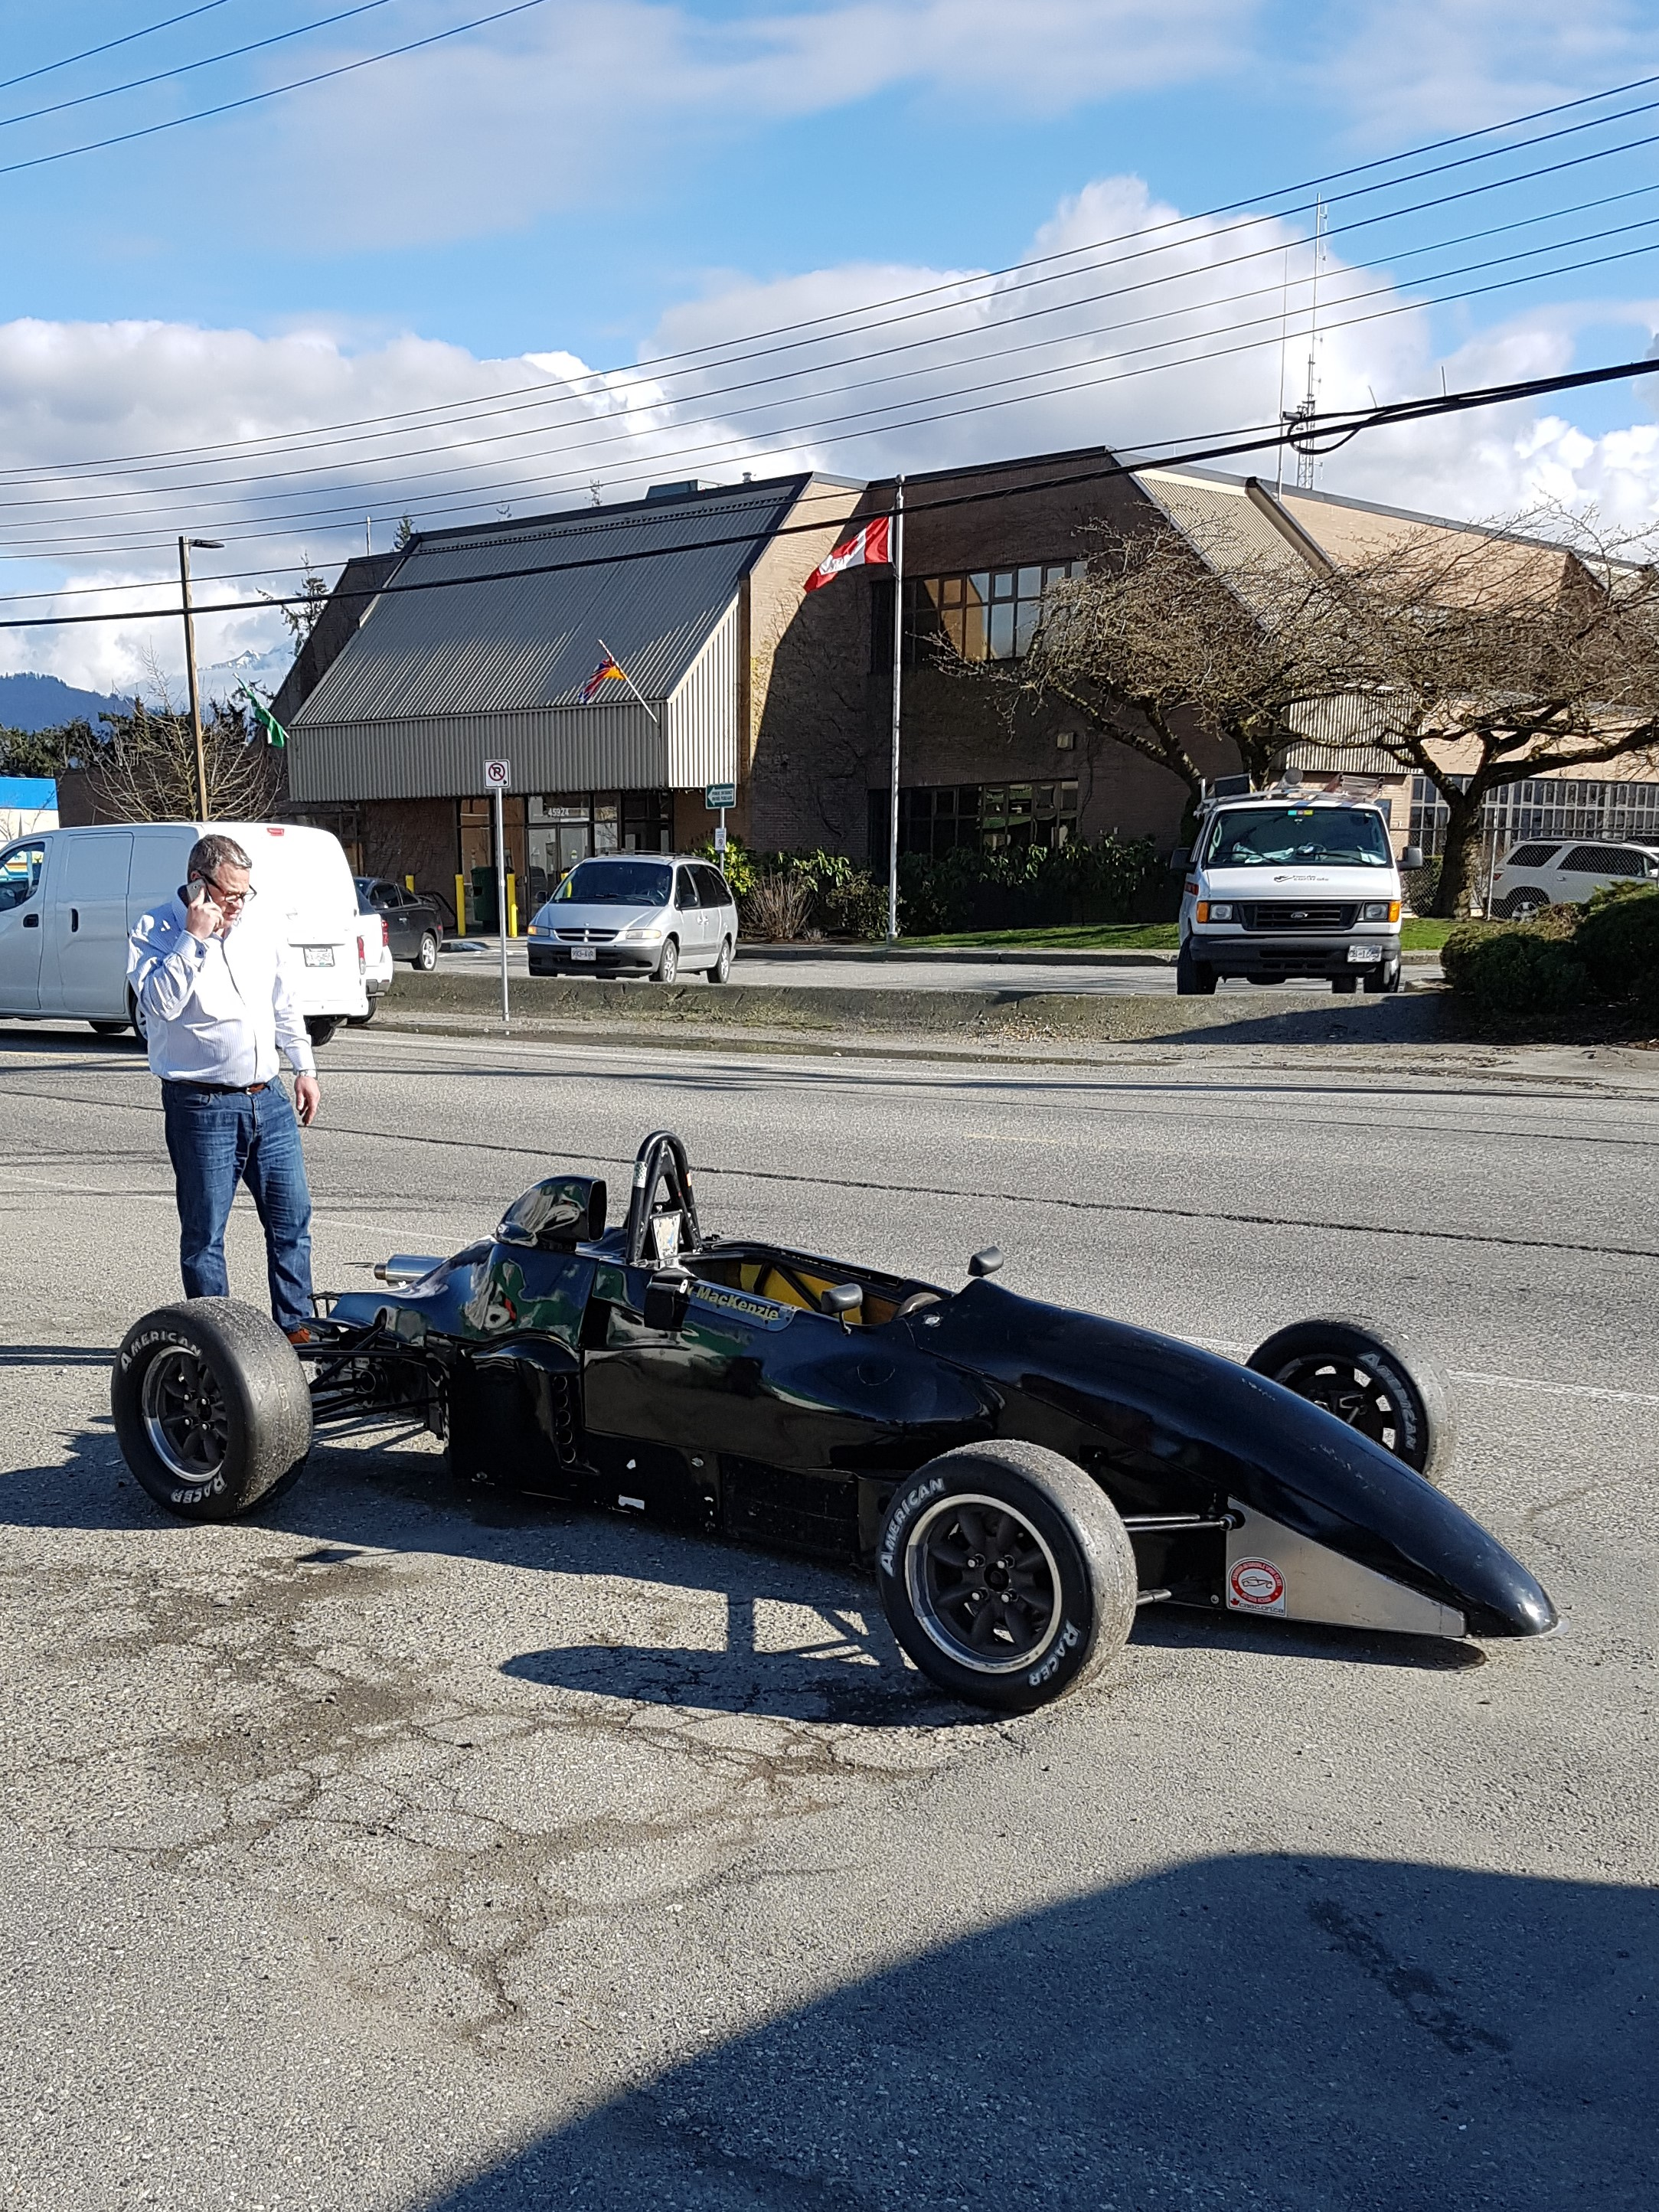 91 Van Diemen Formula Ford F1600 For Sale in Langley - $14900